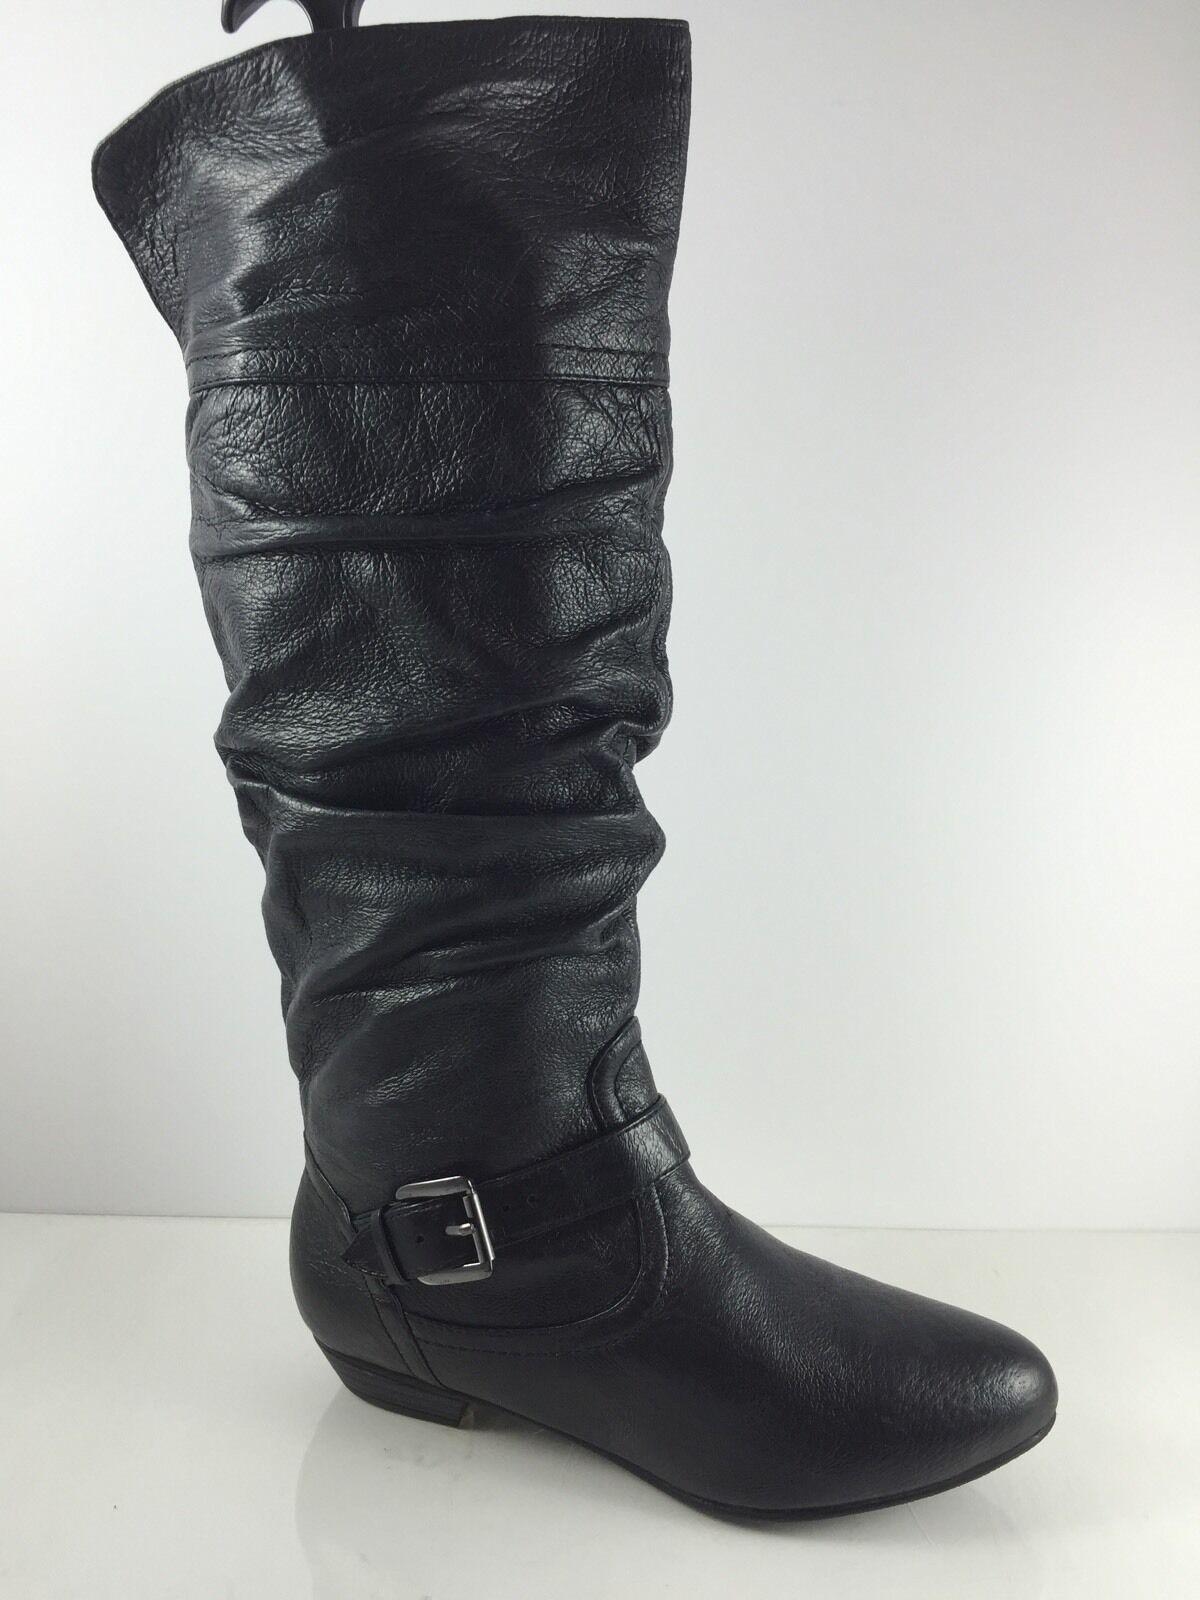 Steve Madden Womens Black Black Womens Leather Knee Boots 6 M eec187